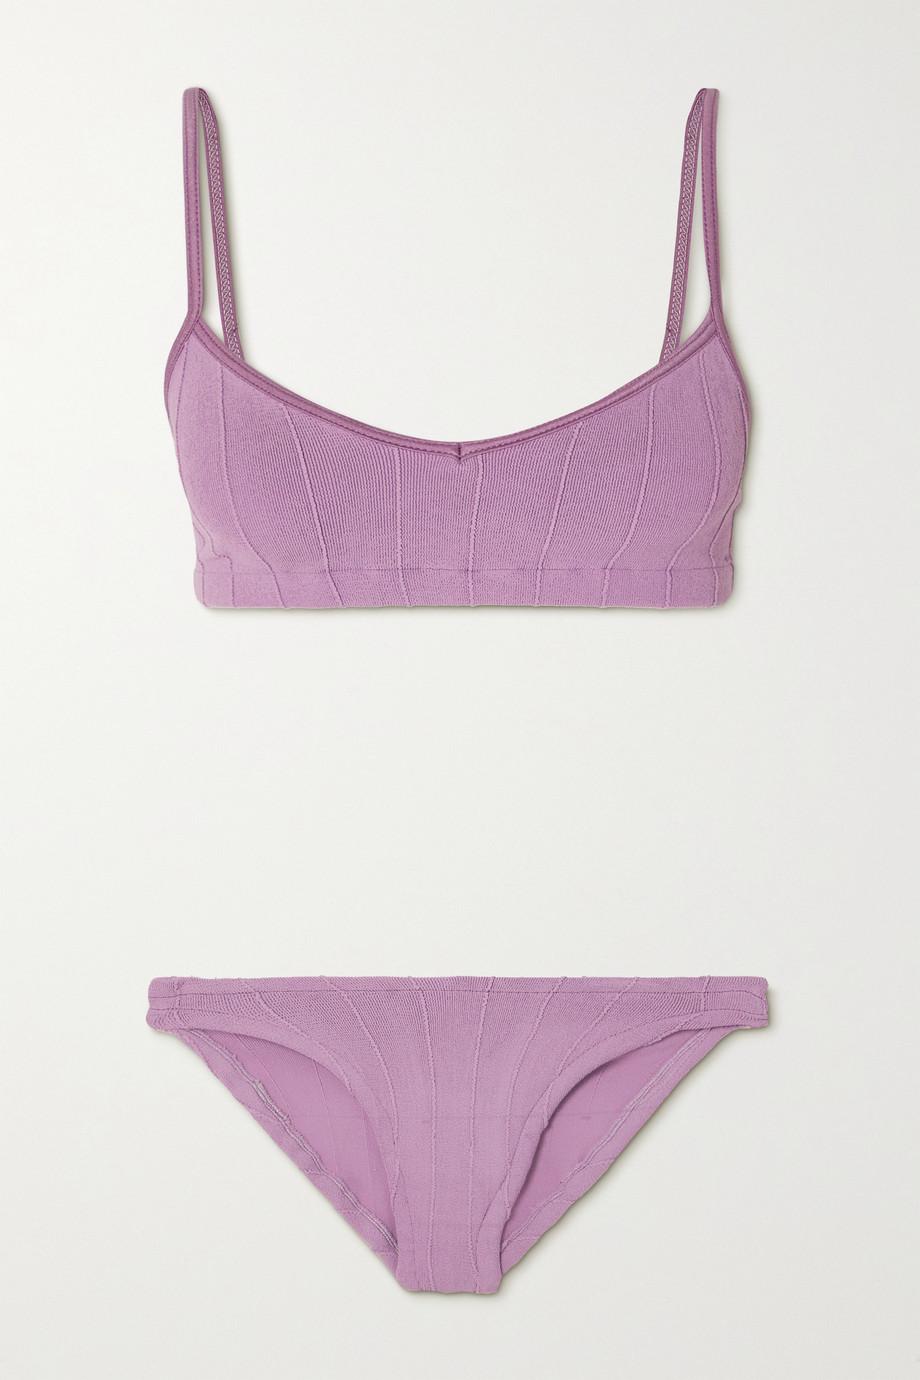 Hunza G + NET SUSTAIN Virginia Nile gerippter Bikini